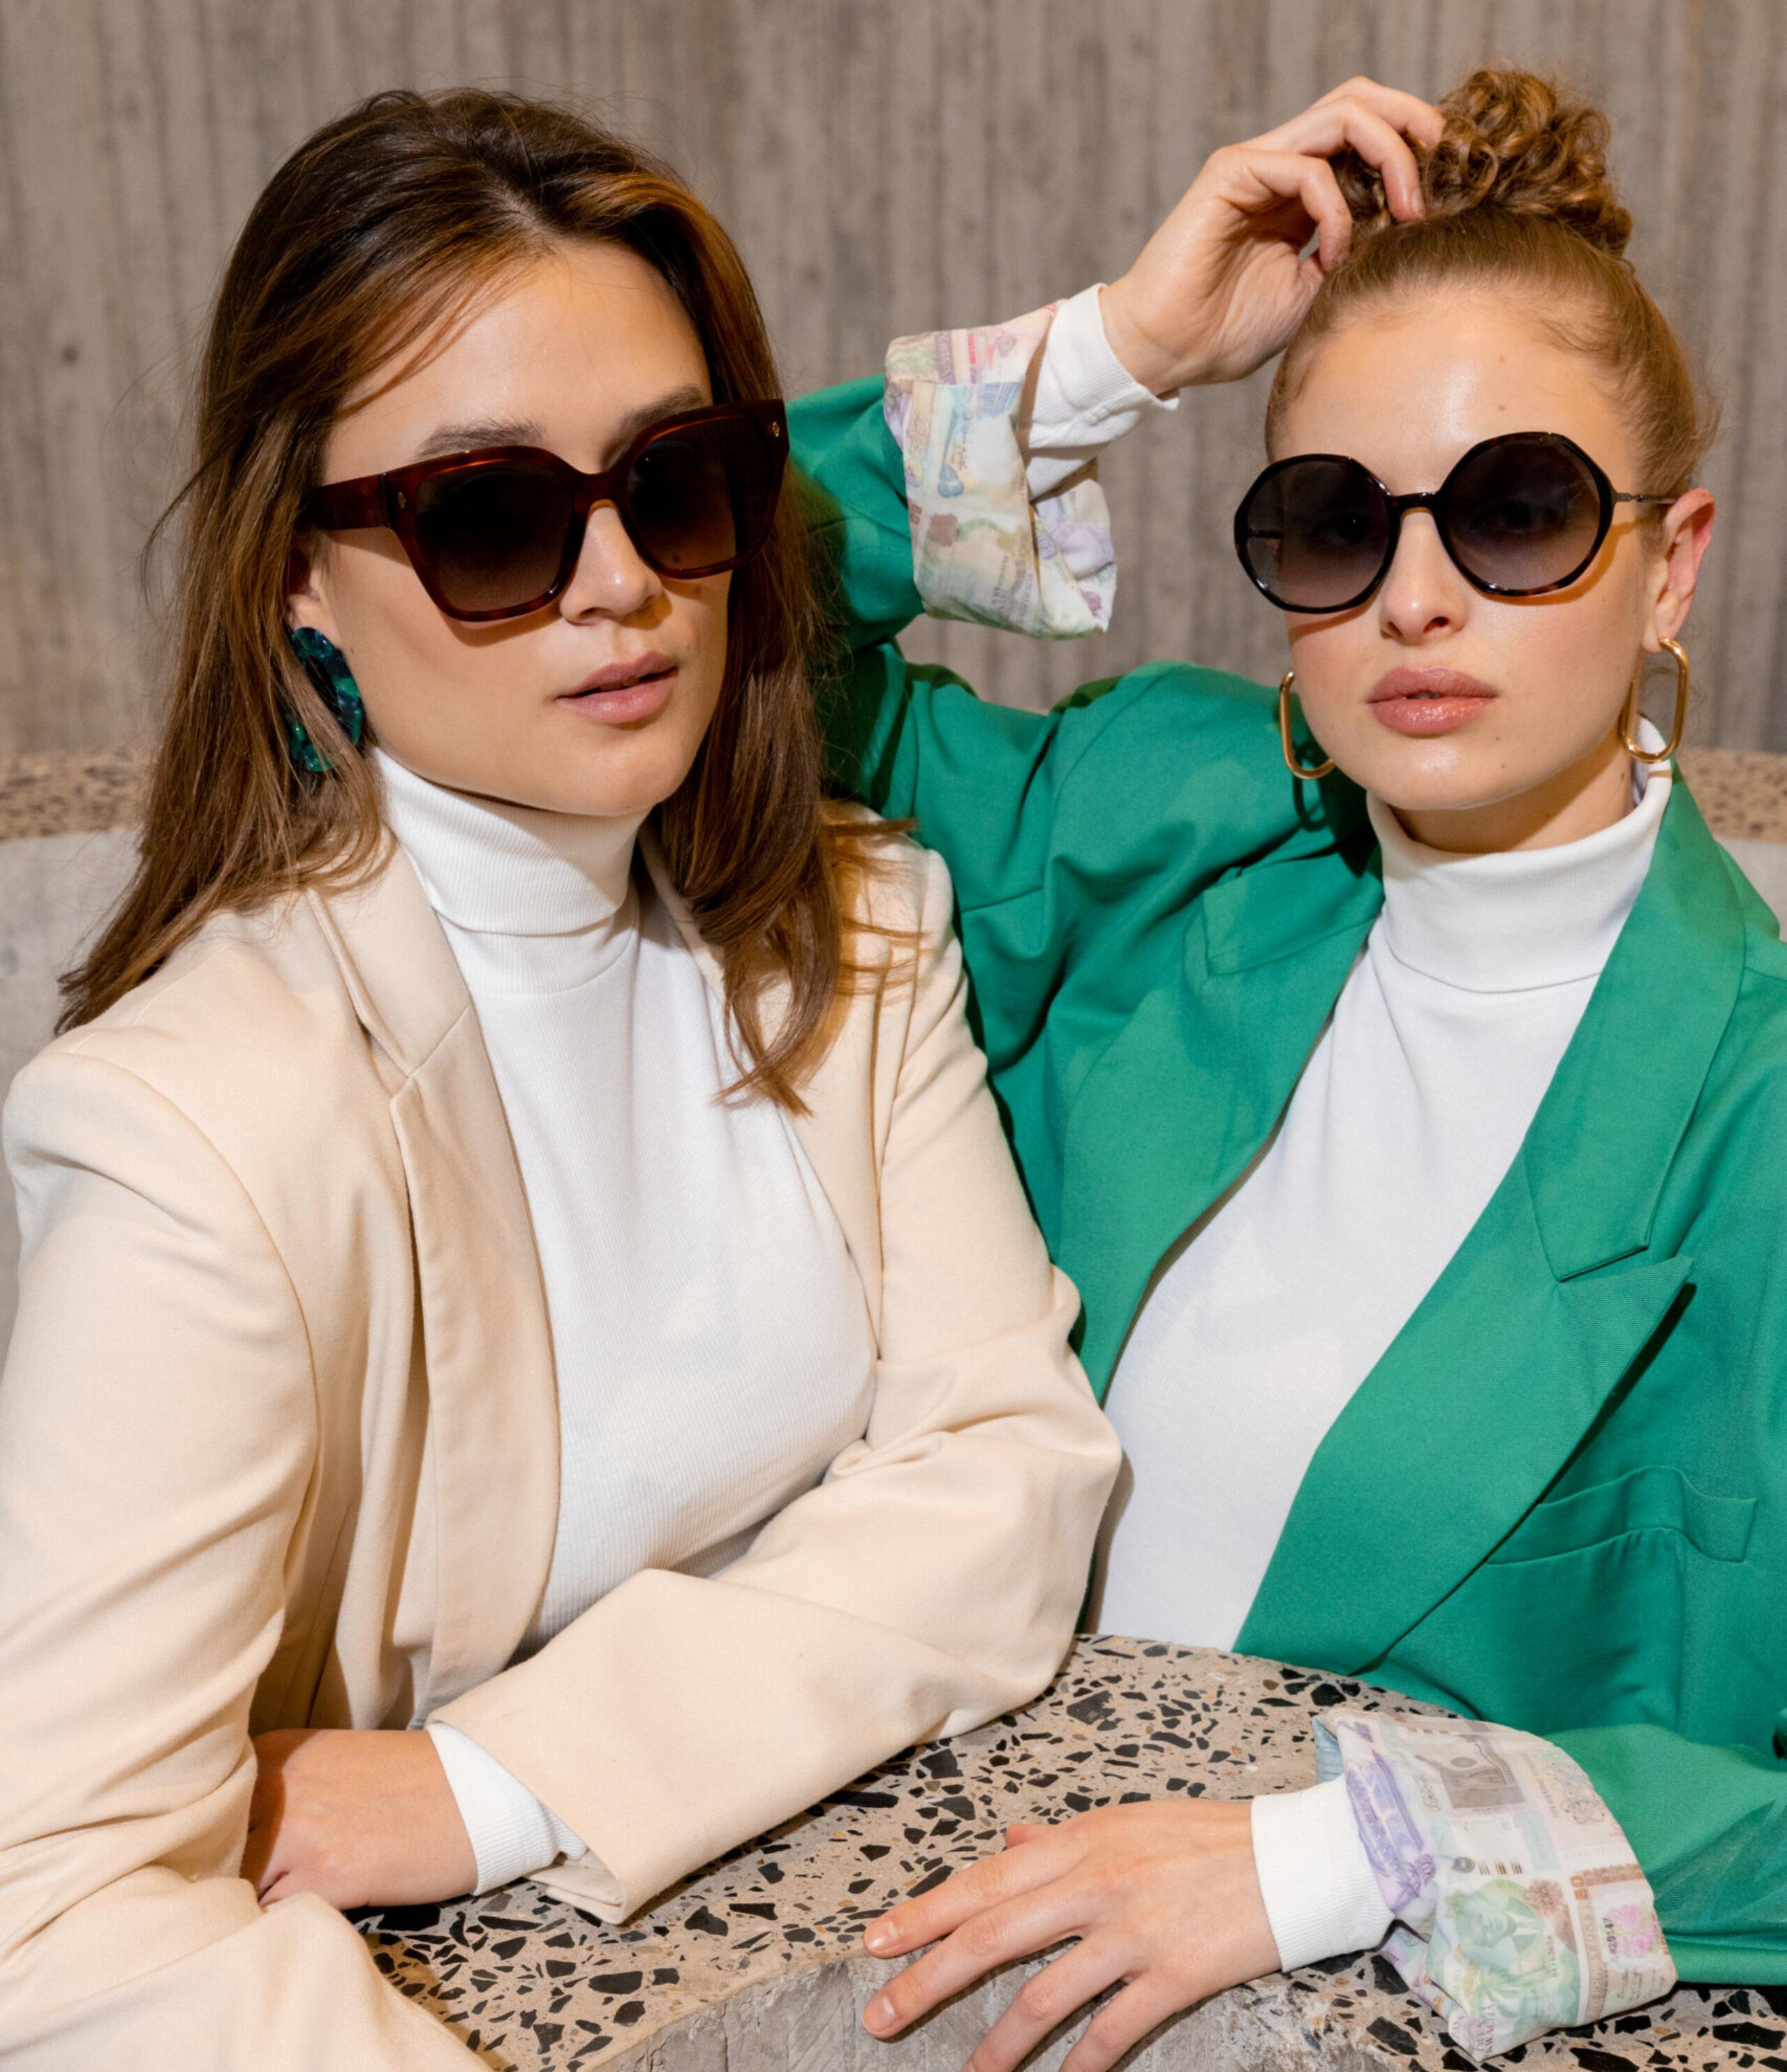 Ba&sh brillen en zonnebrillen • Frames and Faces Deinze